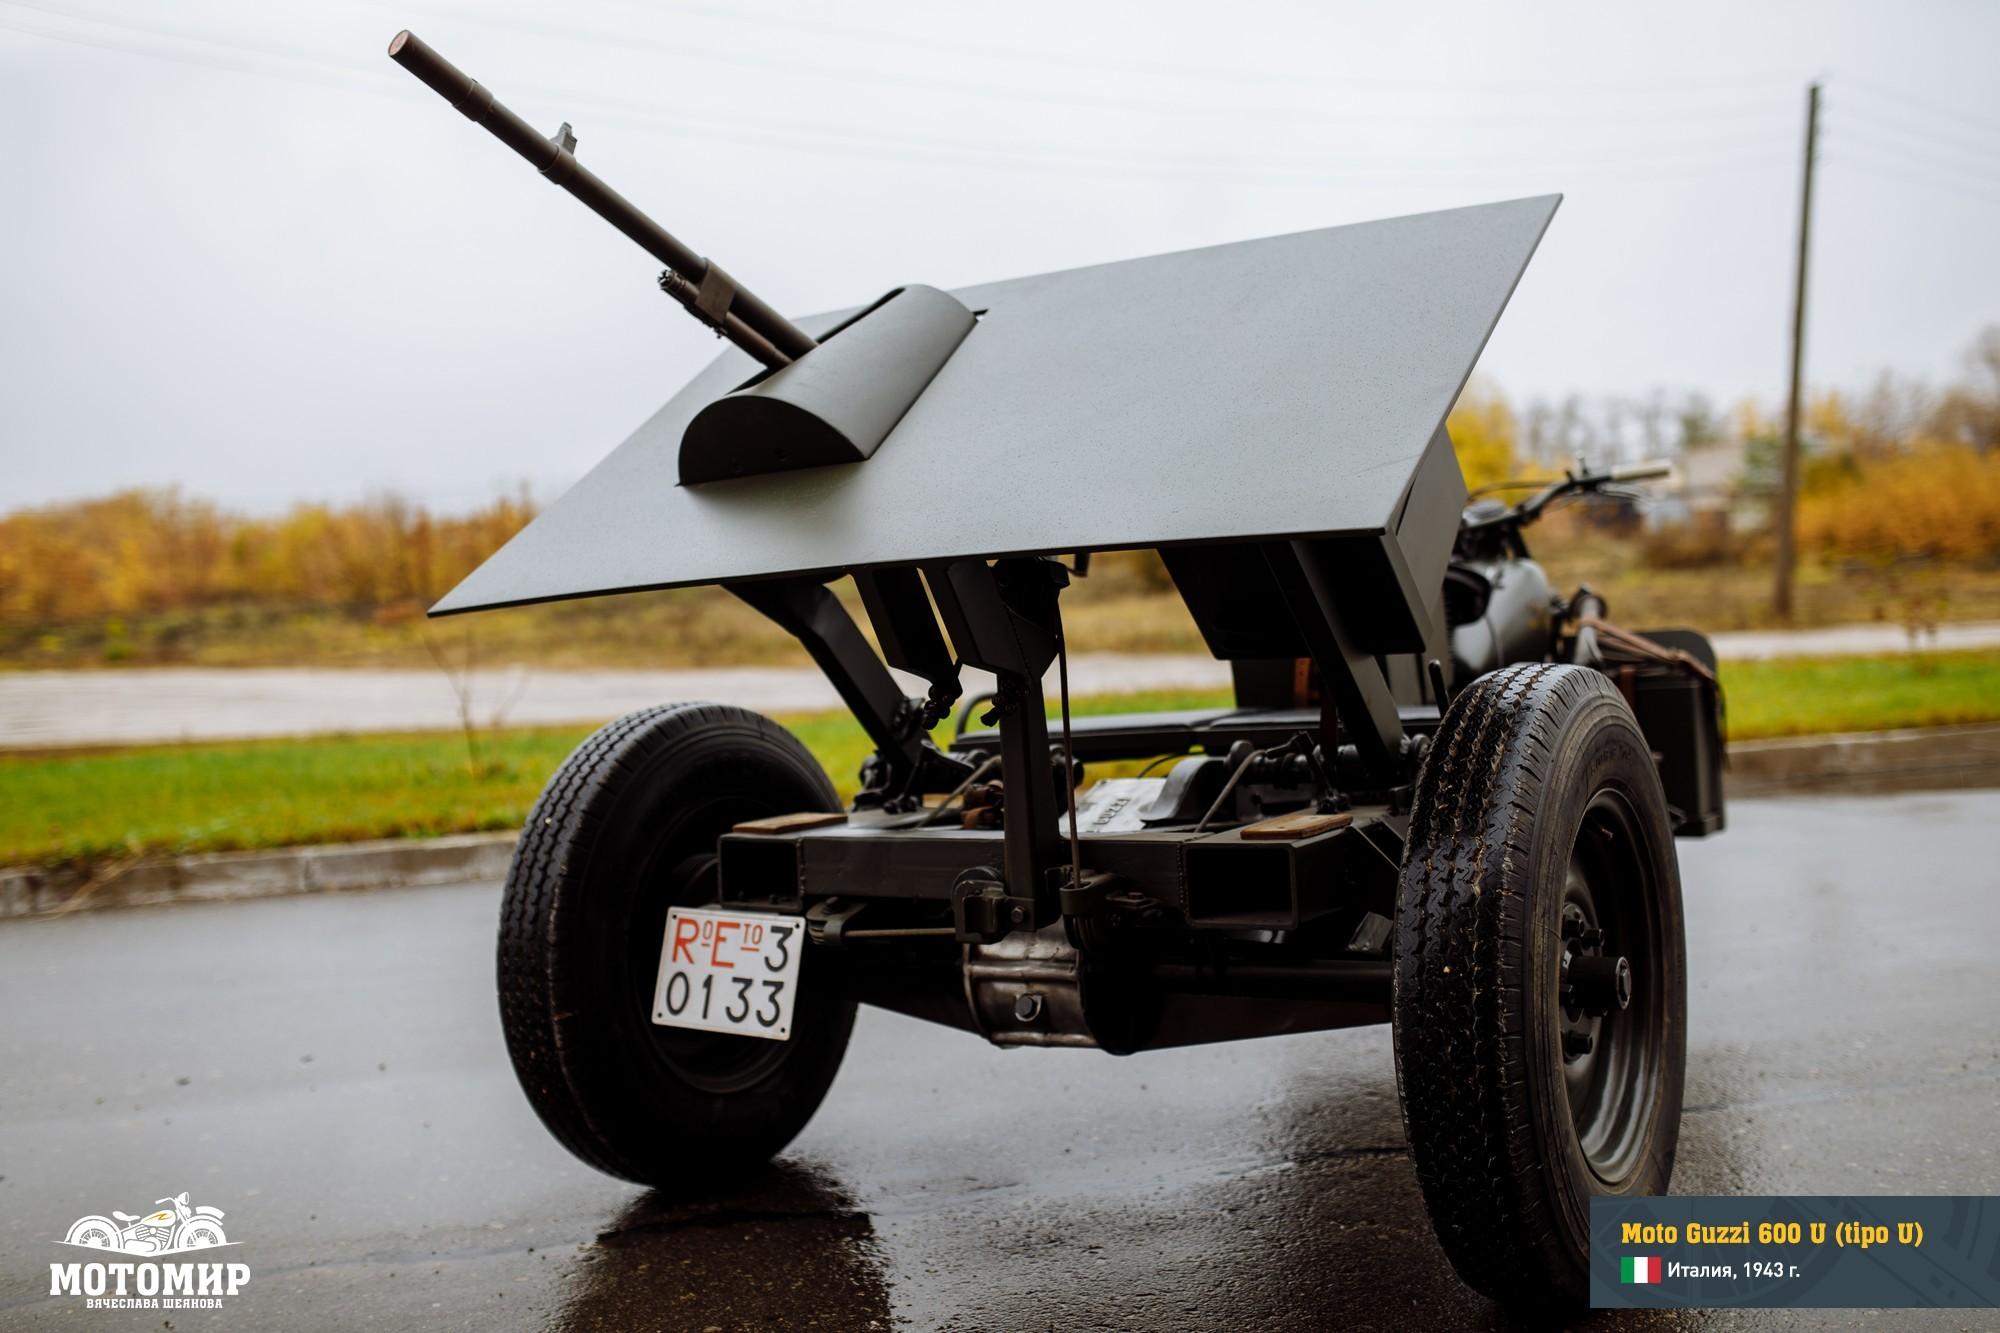 moto-guzzi-600-u-web-54